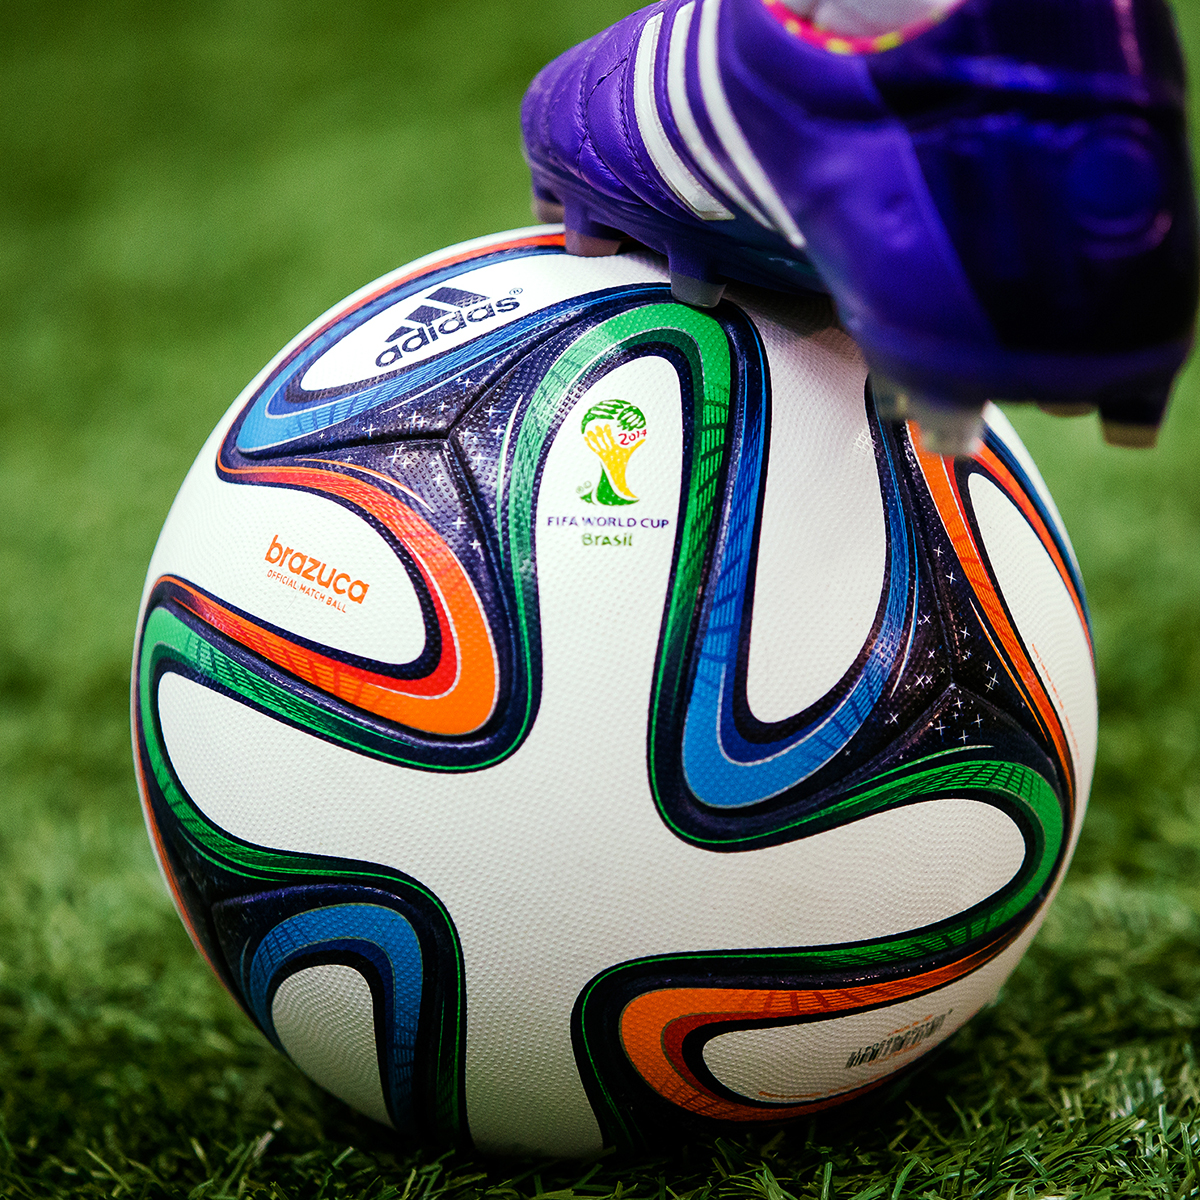 World Cup Brazil 2014. Tumblr_static_a39z7ix8yhkckwsgw8g08s4gs